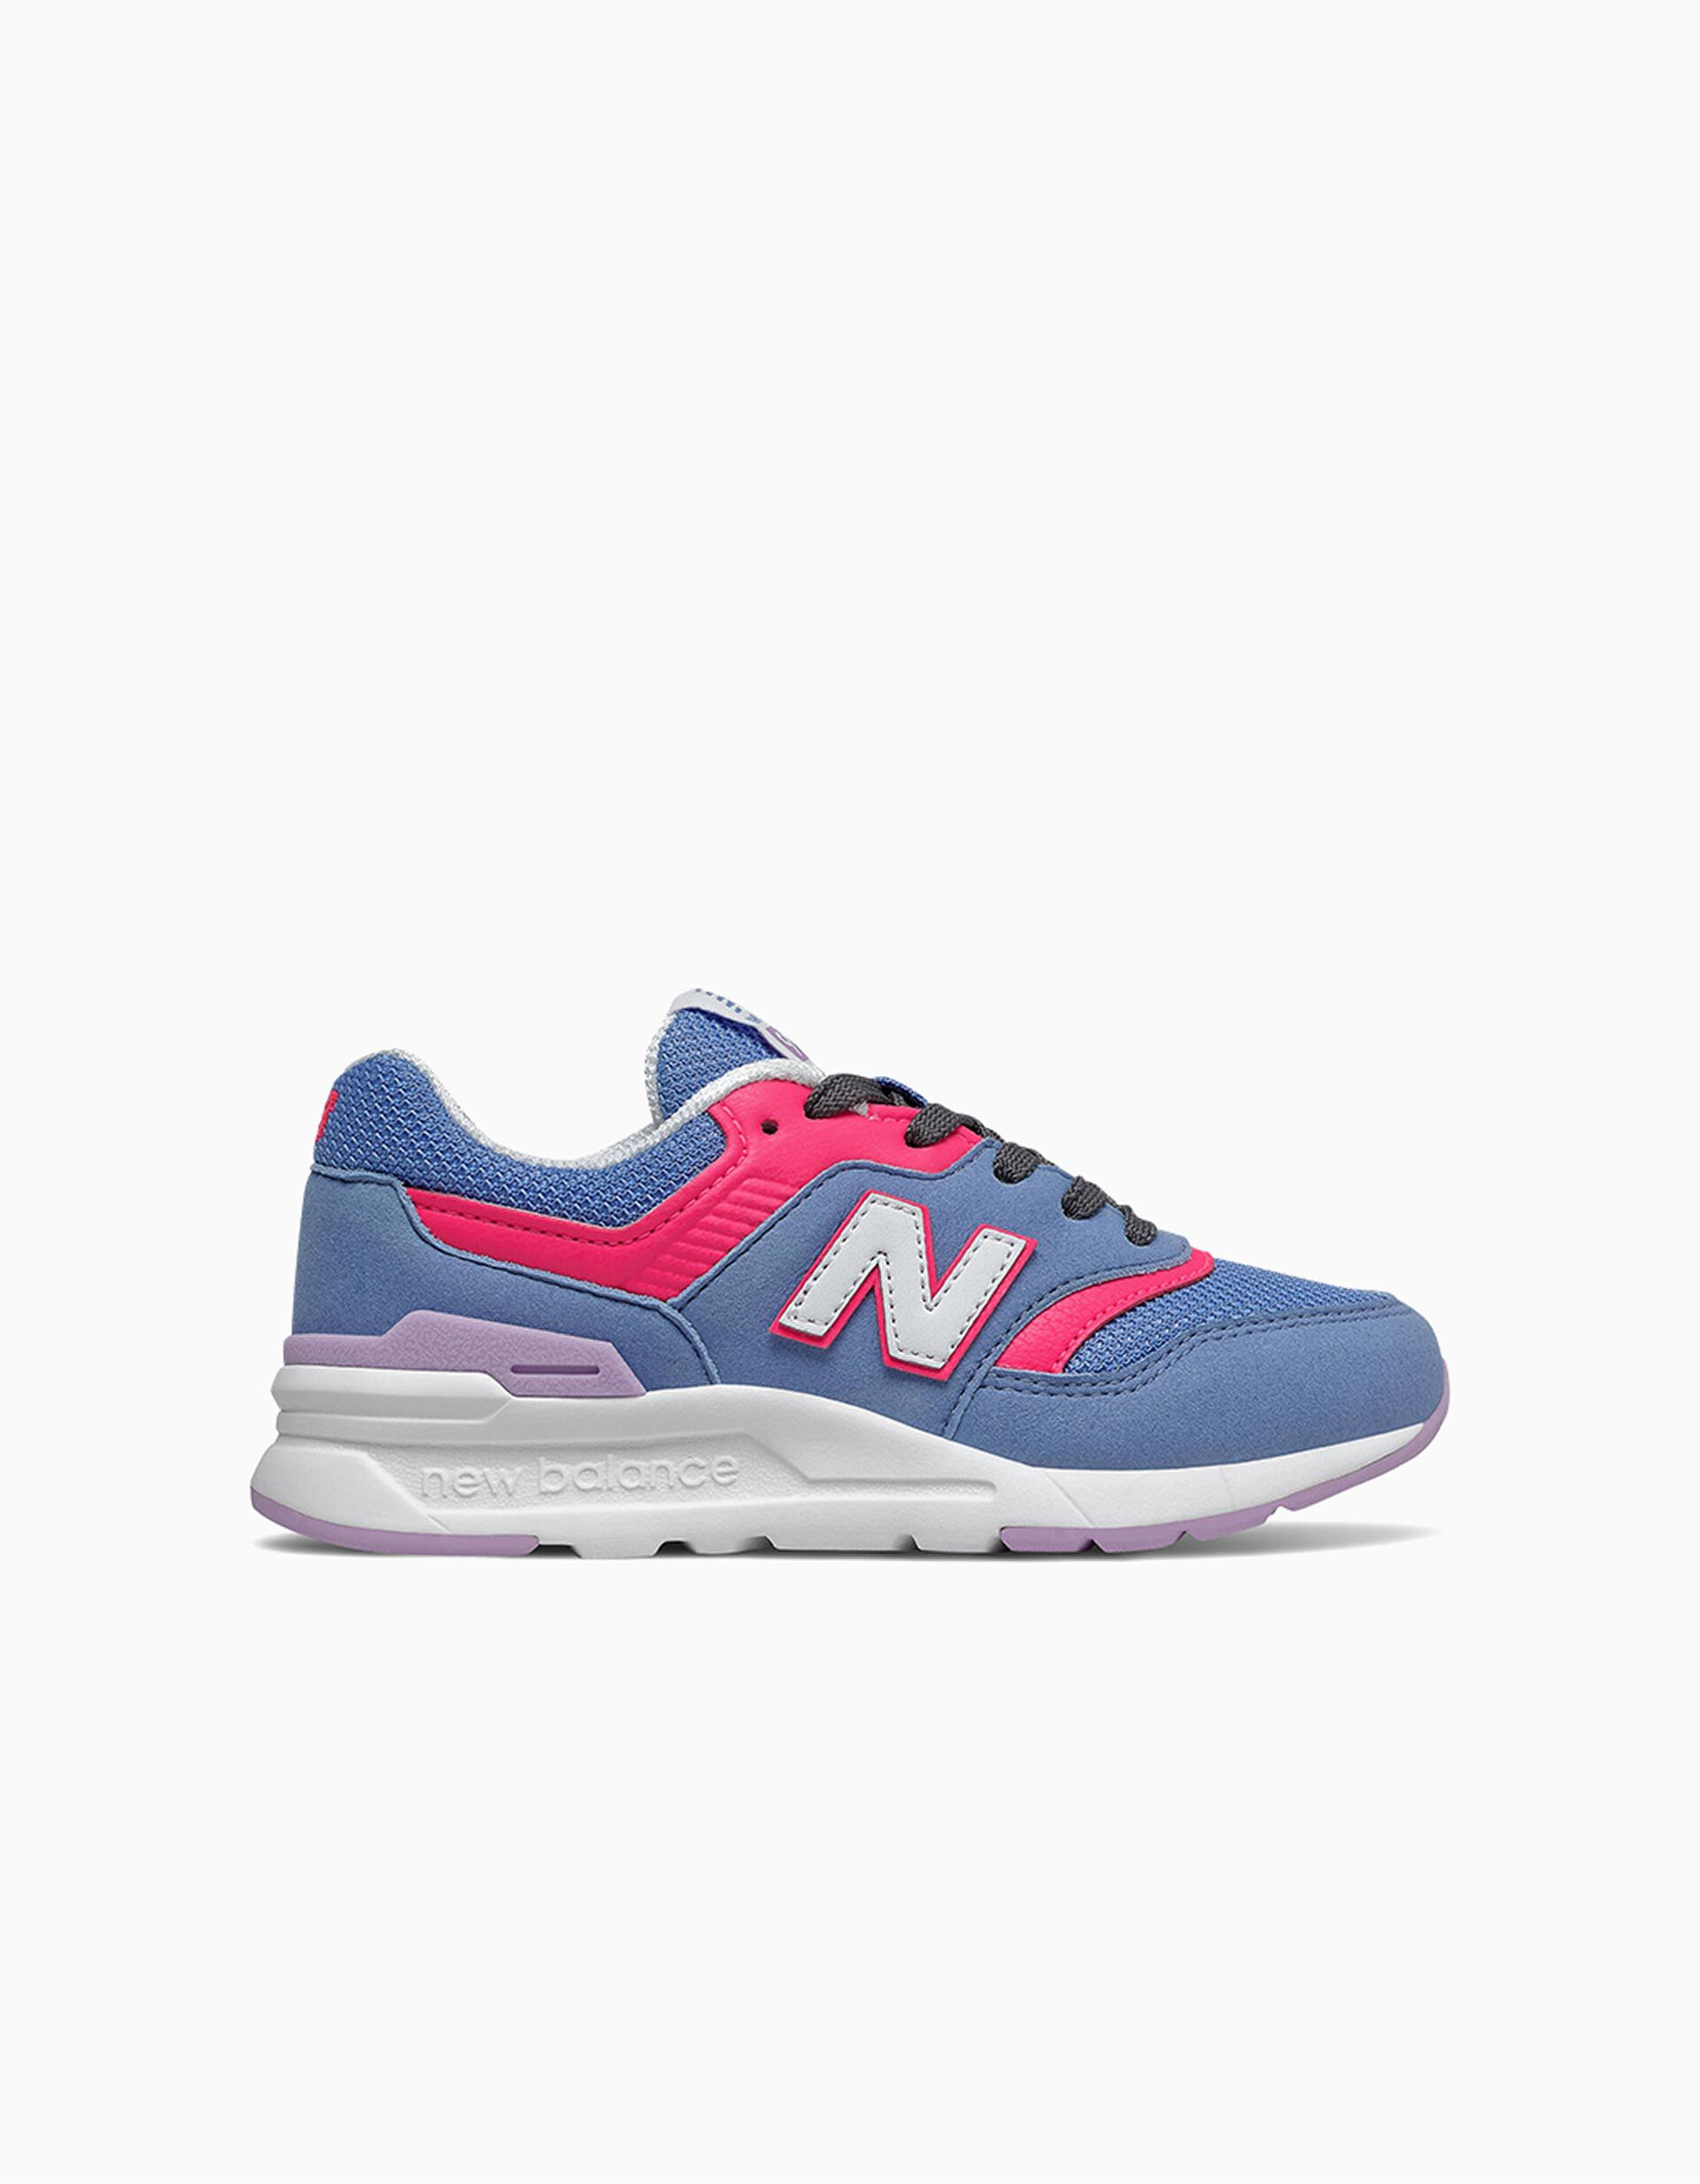 Baskets fille 'New Balance 997H', bleu/rose